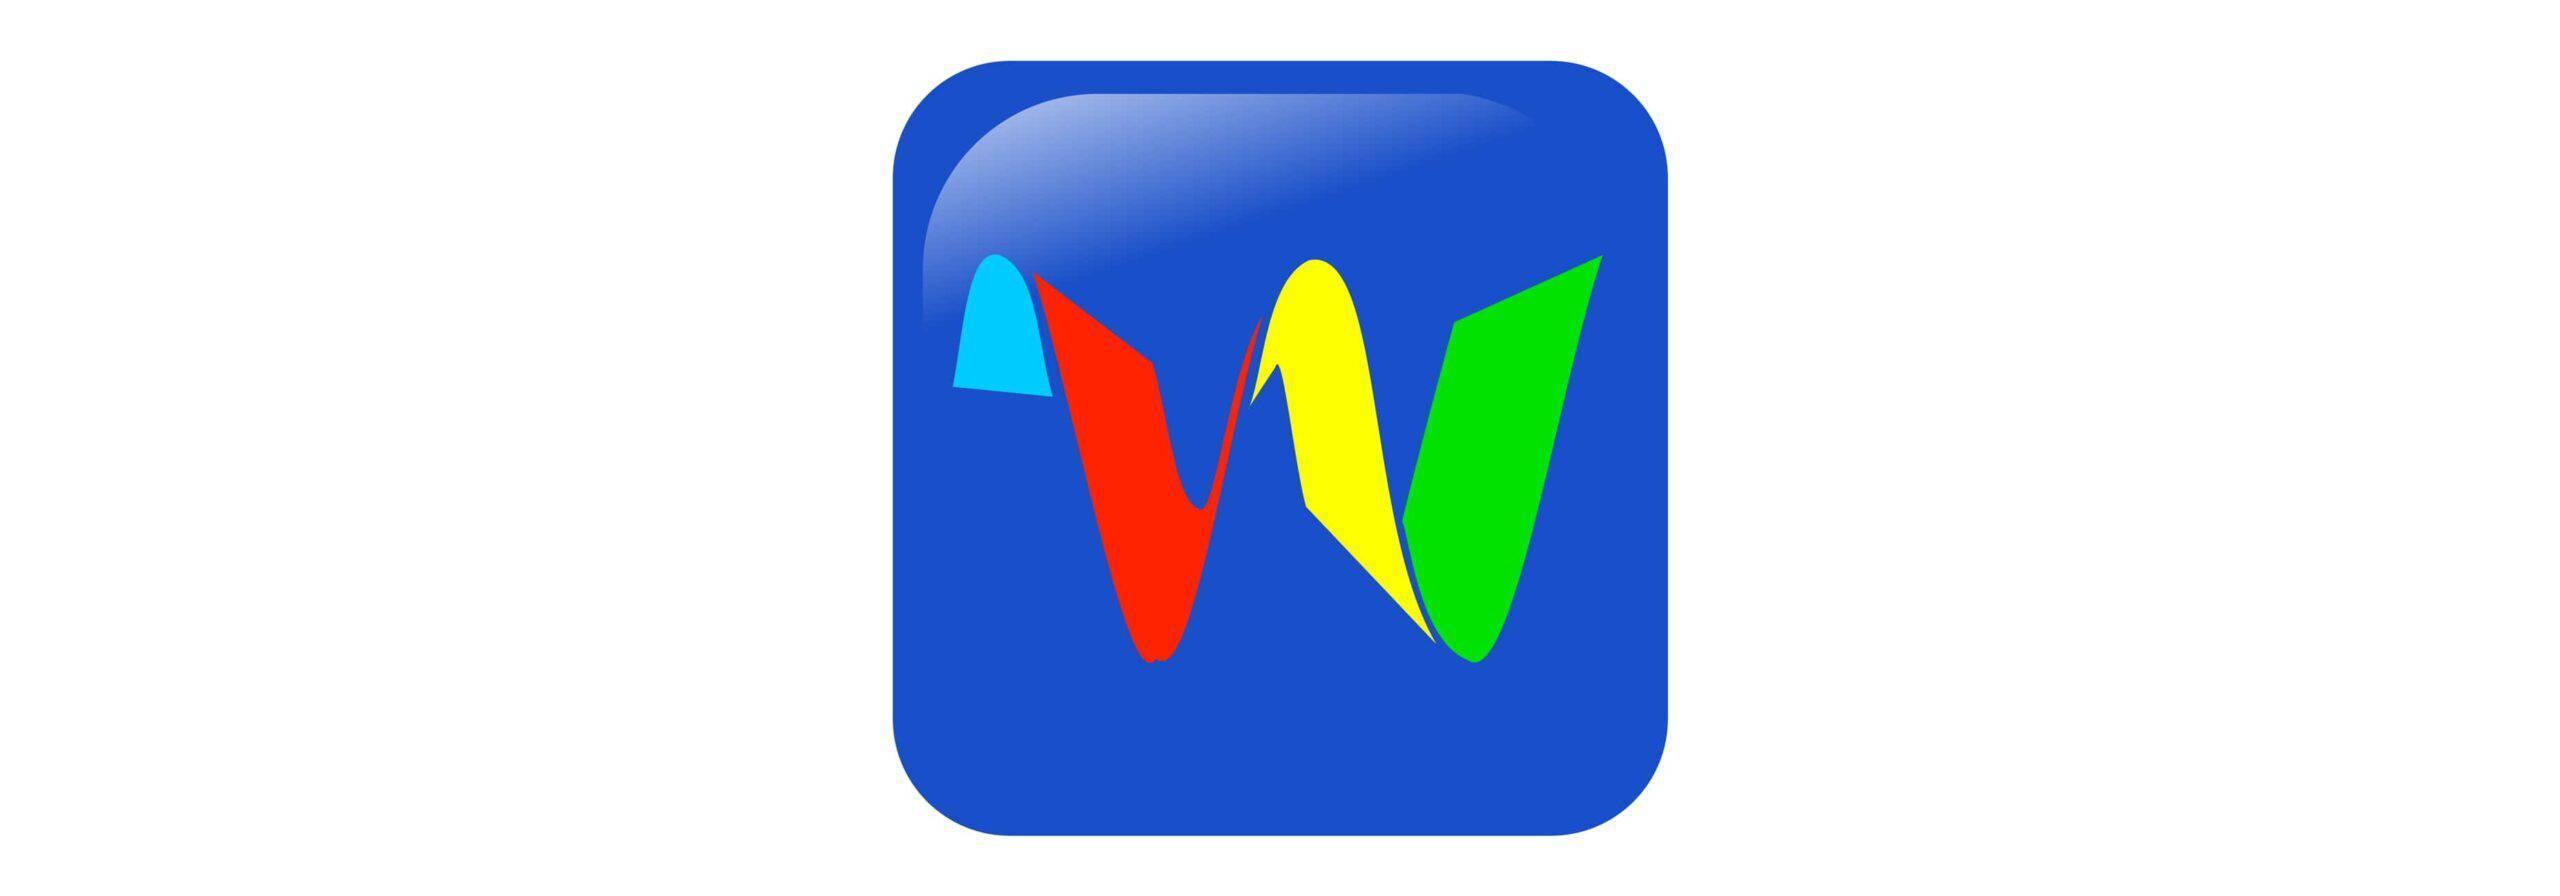 Wave networking platform from Google